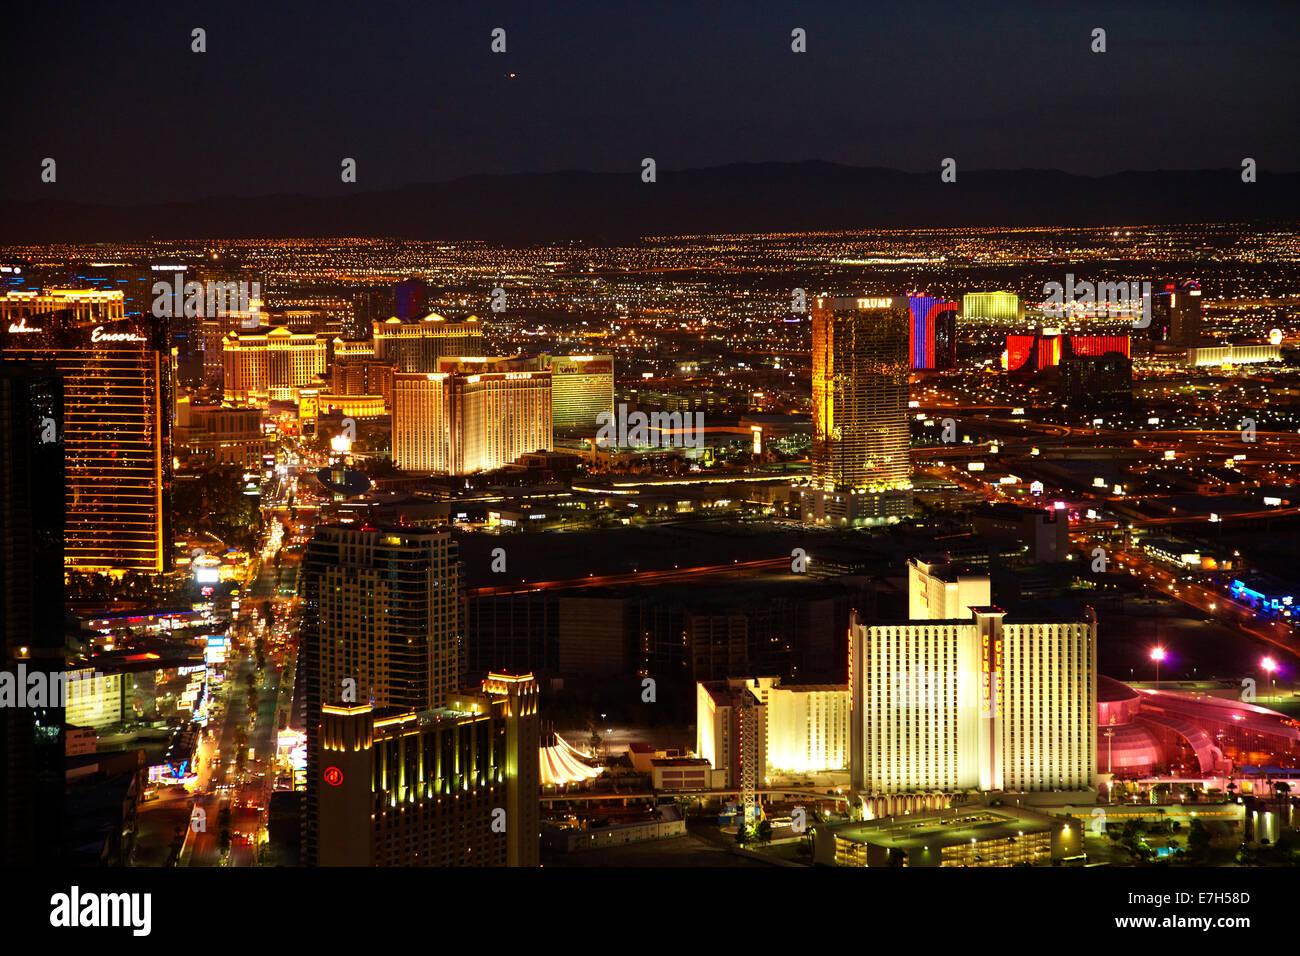 Casino hotels vegas strip